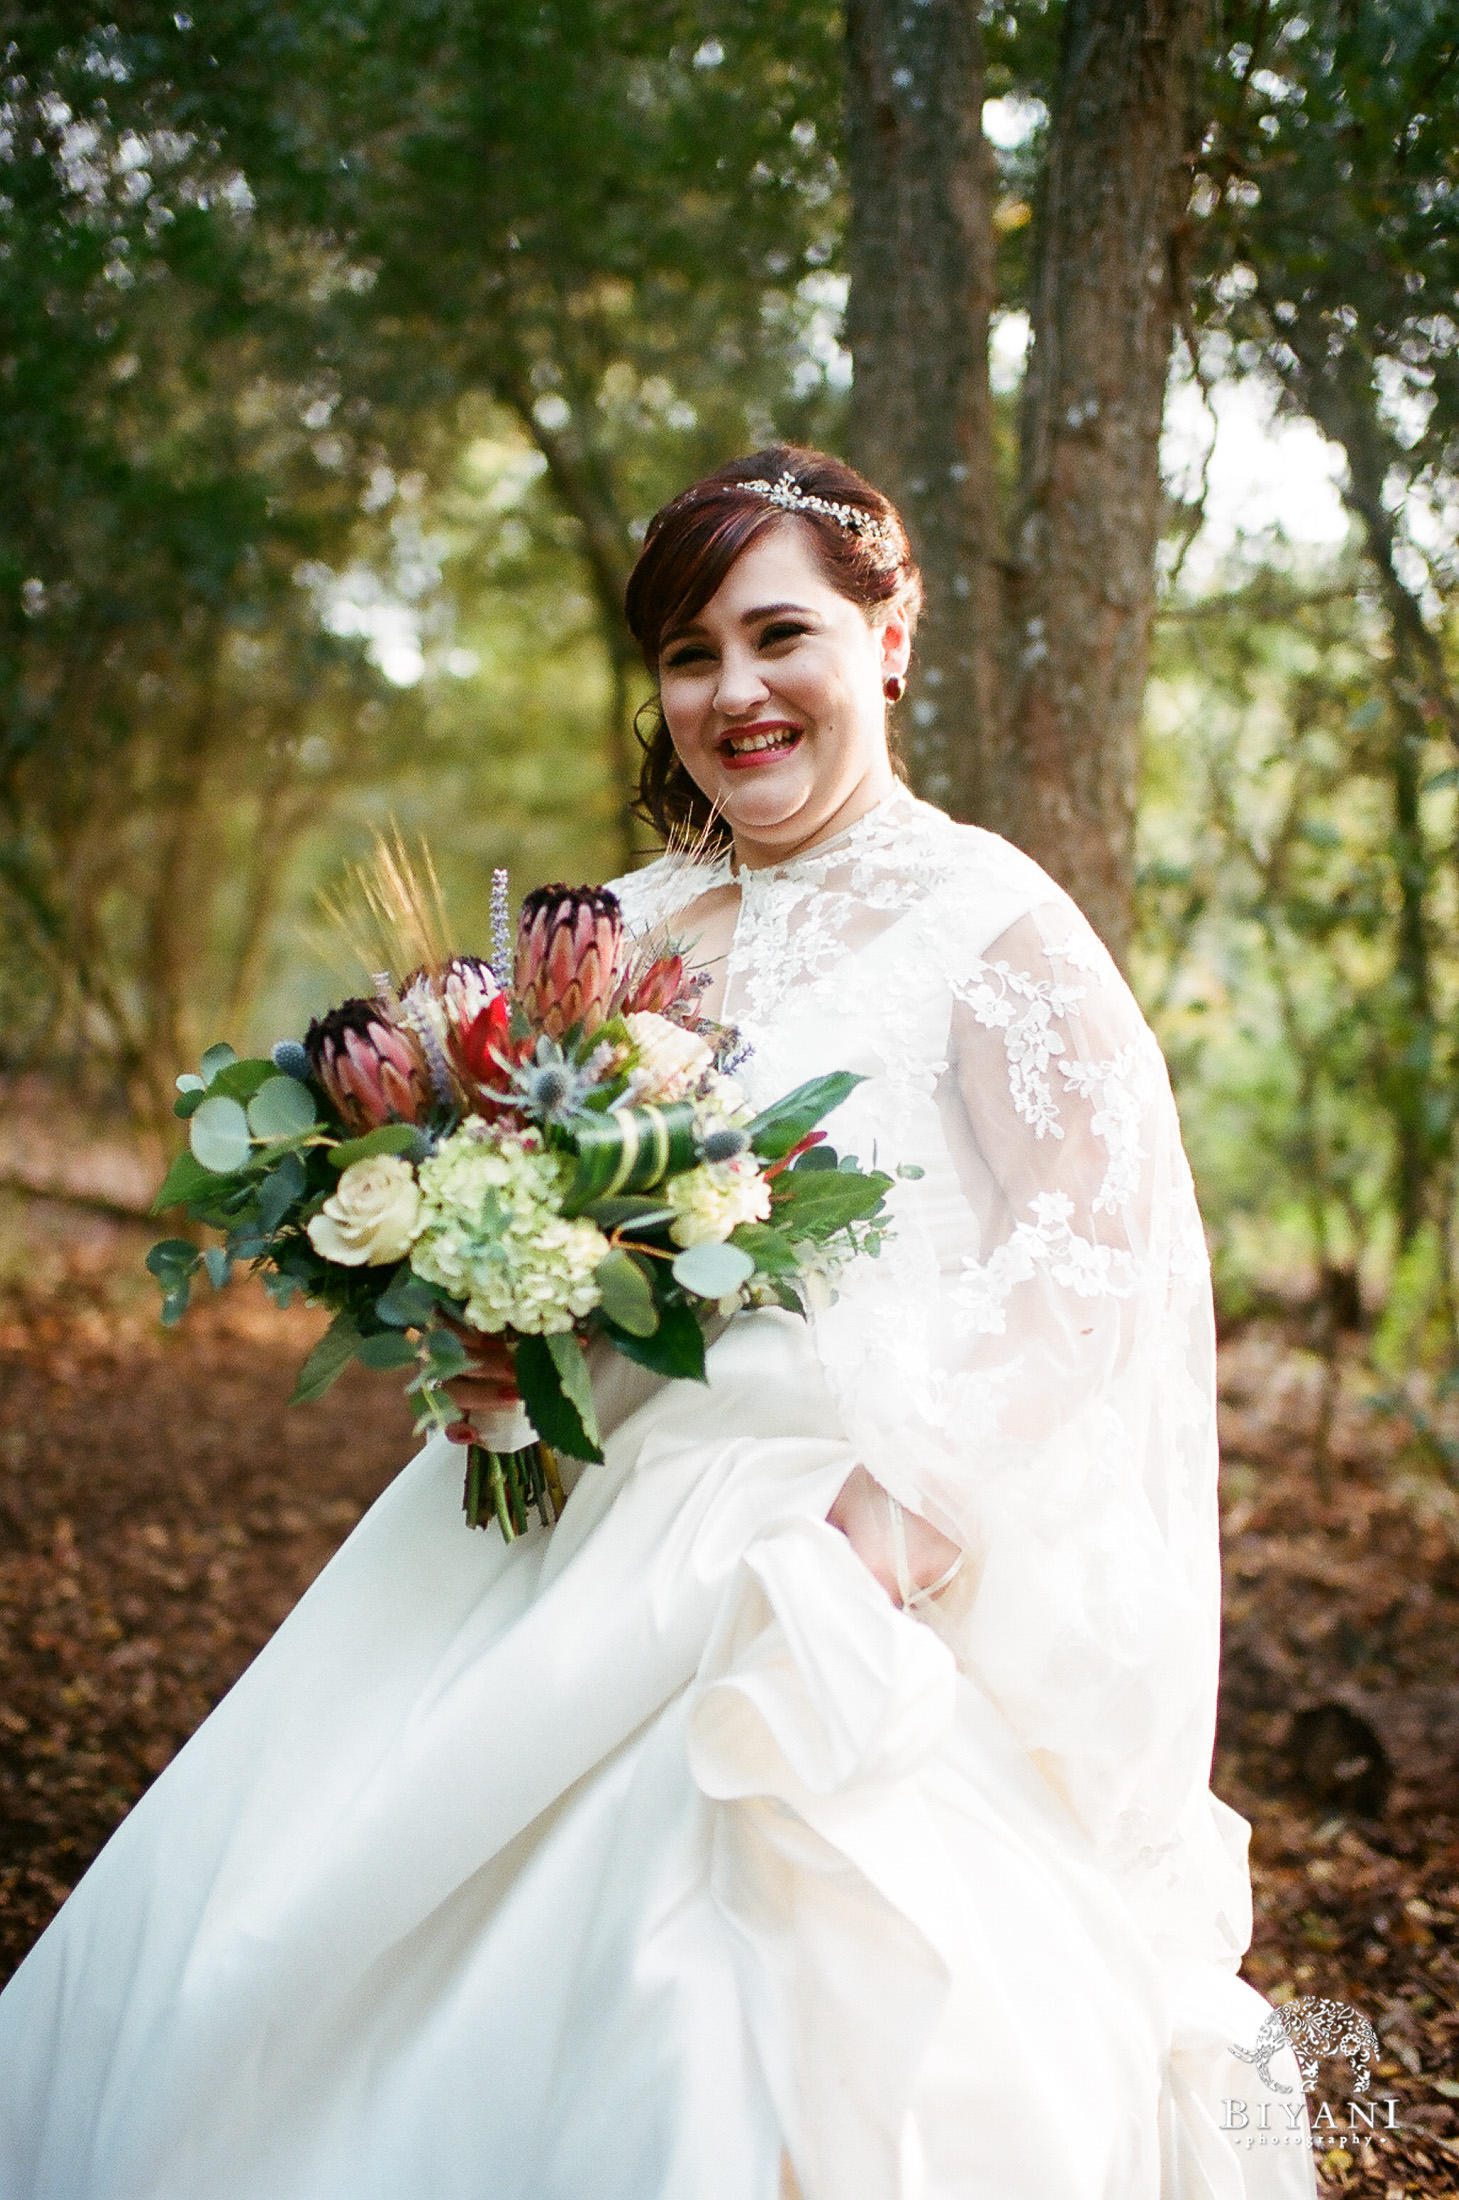 Bride getting ready to walk down aisle